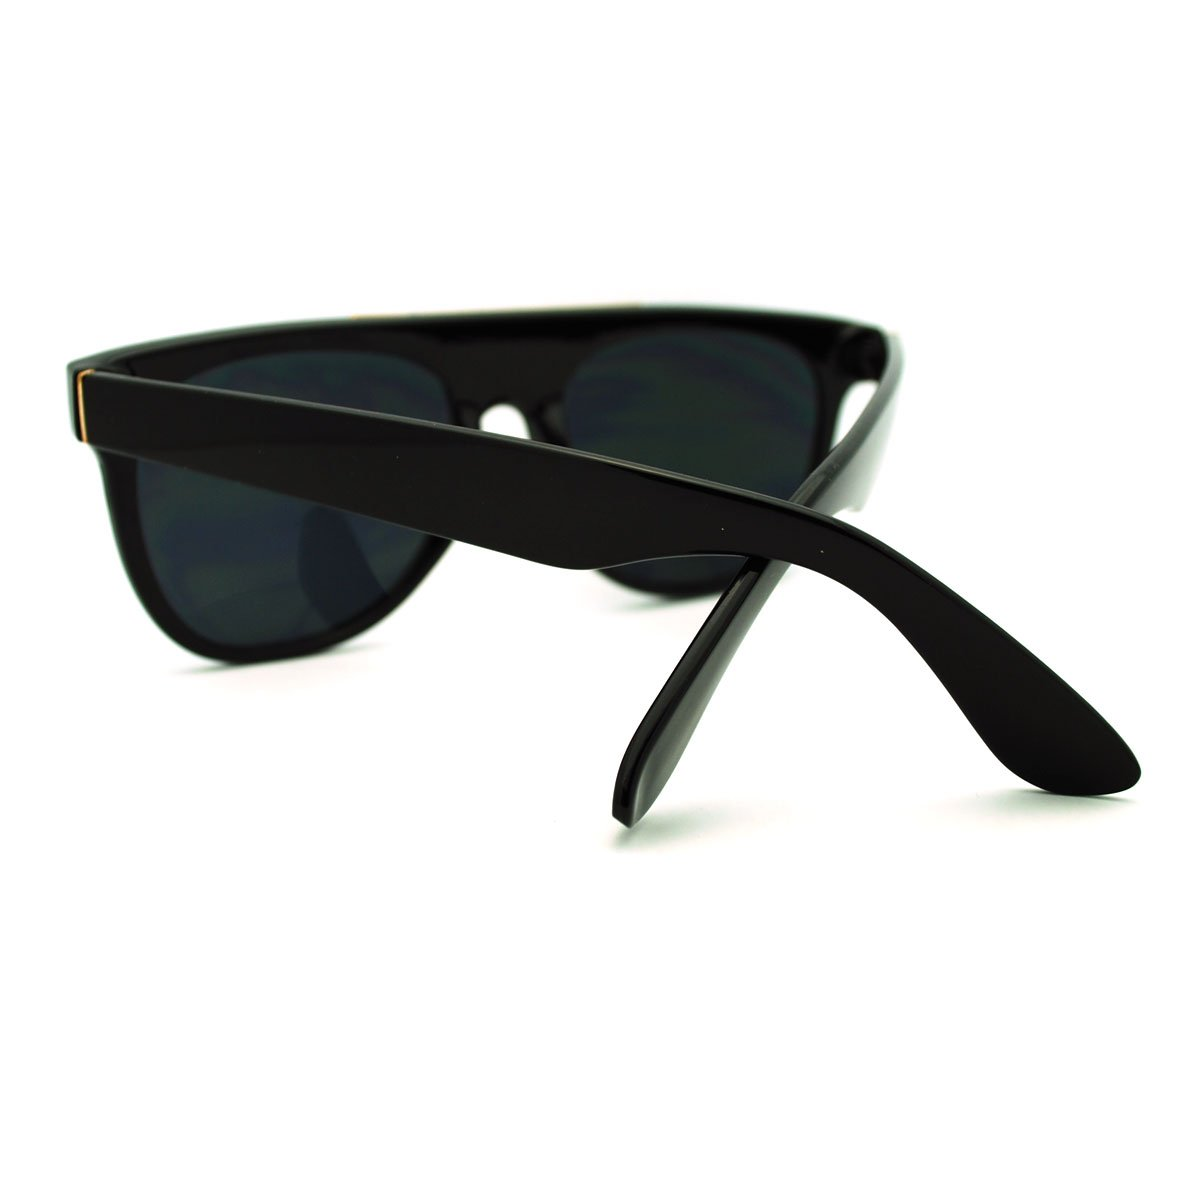 Black Super Trendy Metal Triangle Brow Flat Top Sunglasses